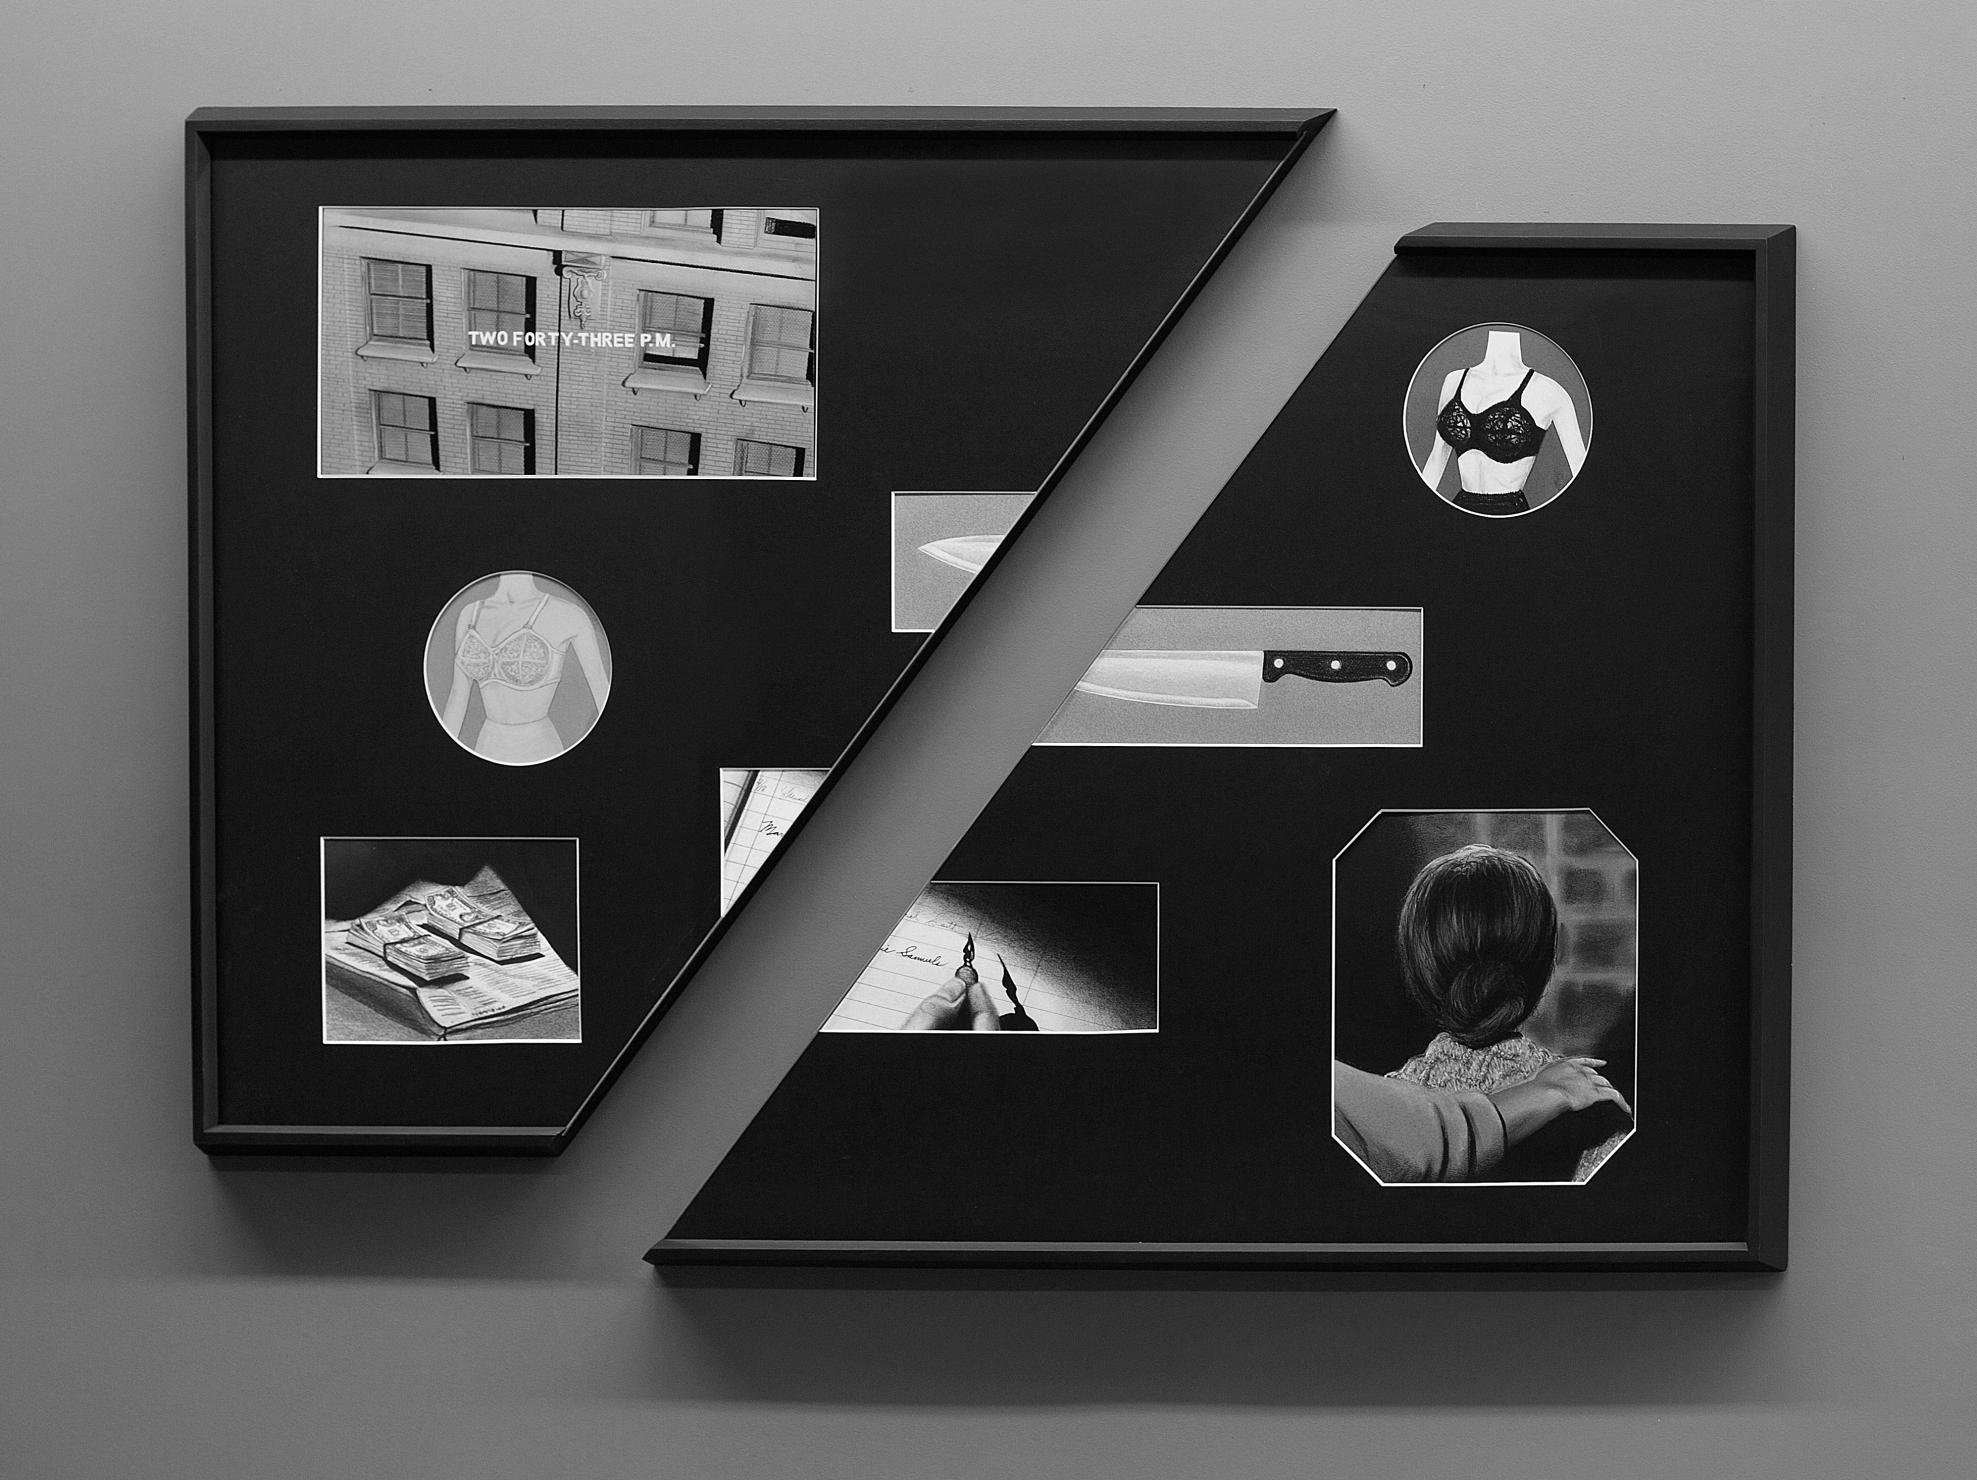 Psycho, 2016. Lápiz y pastel sobre papel. 80 x 120 cm.